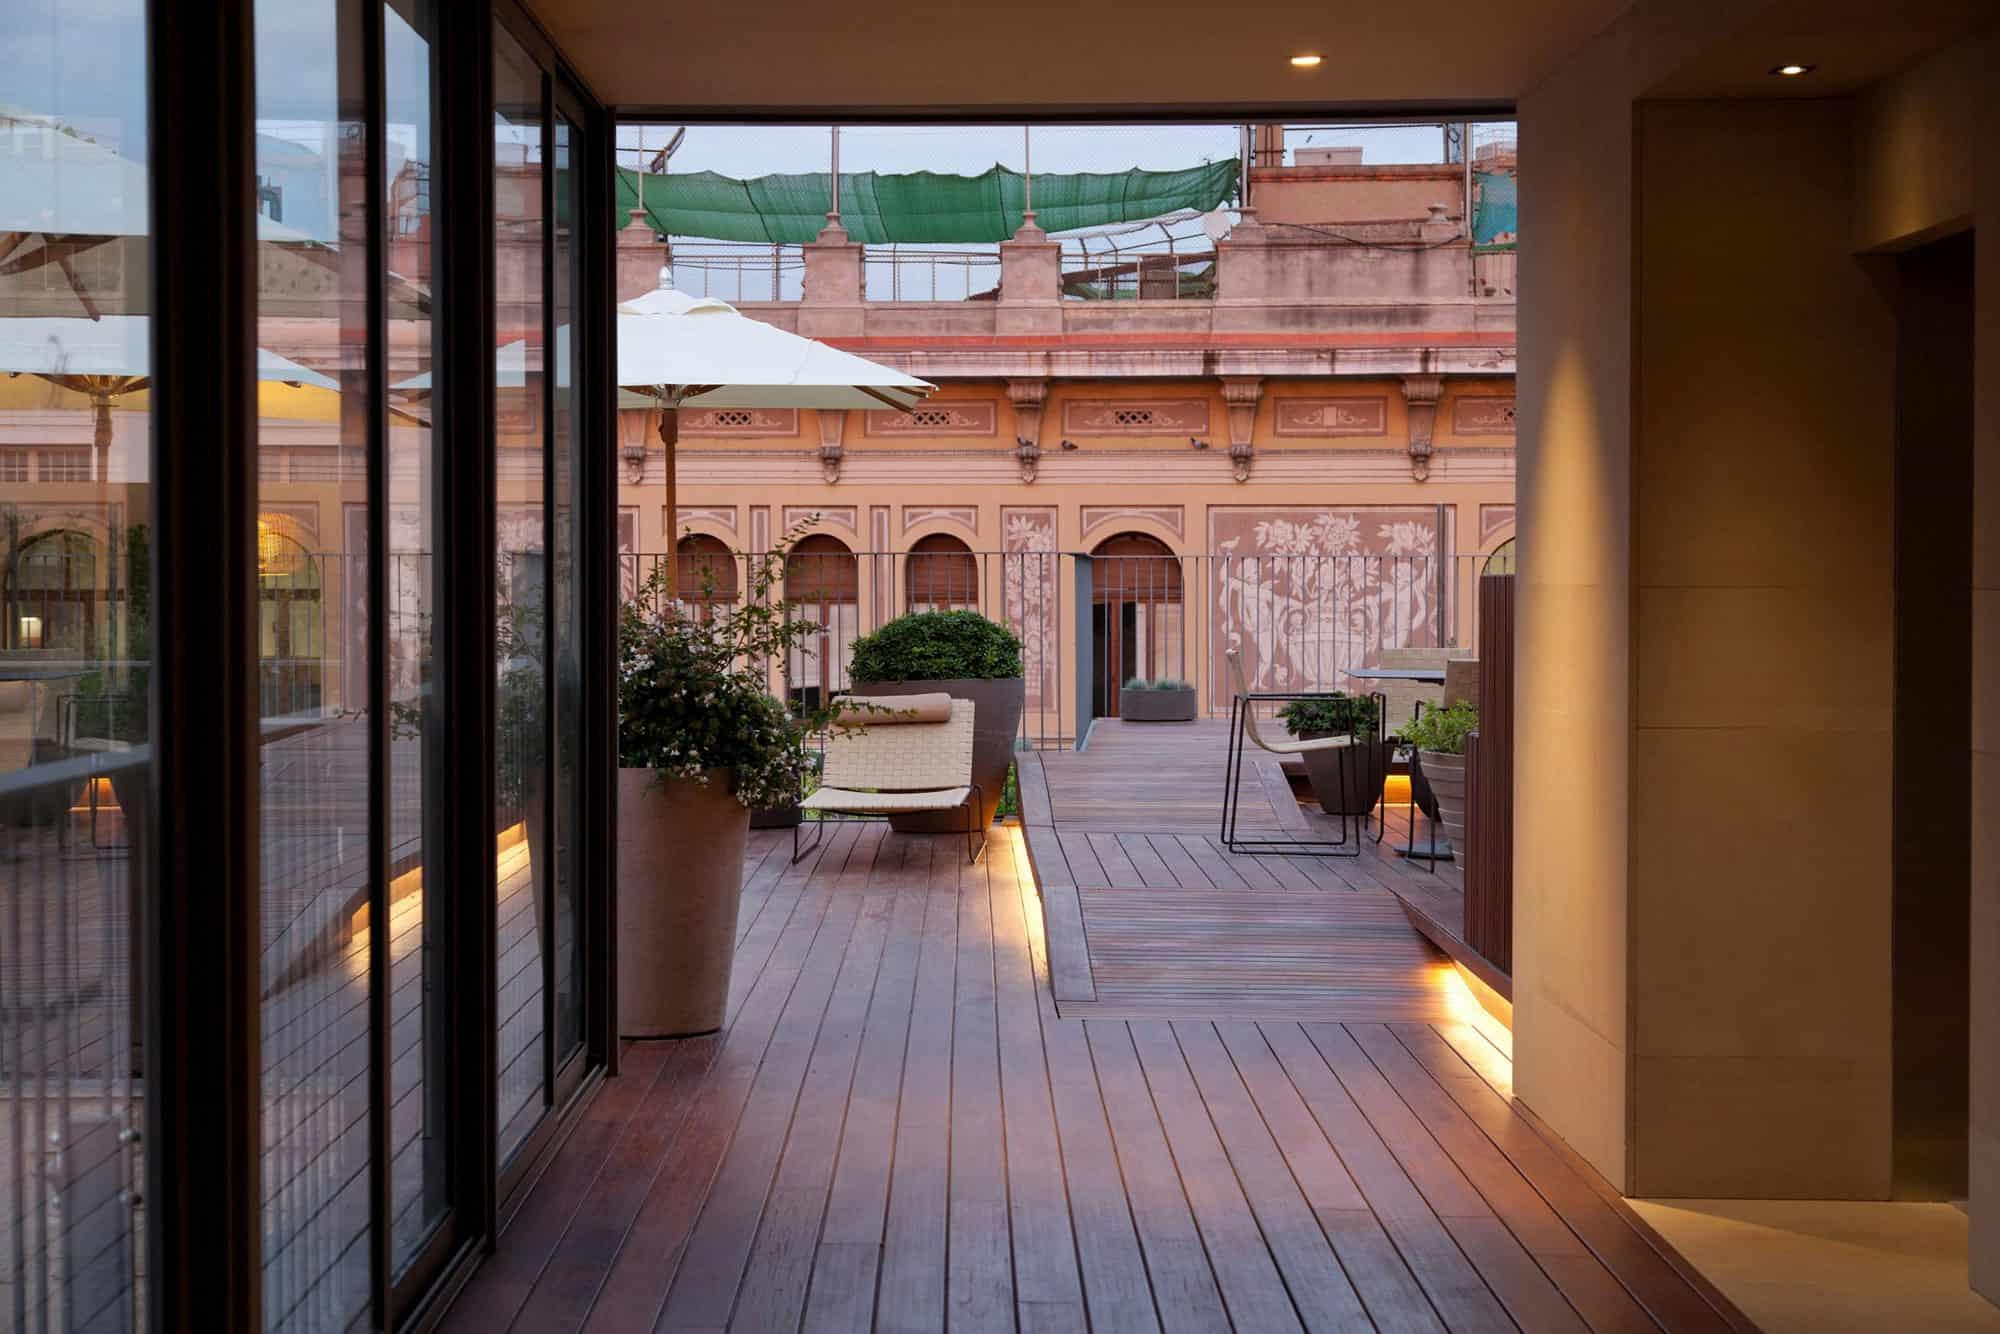 Mercer Hotel Barcelona by Rafael Moneo (19)